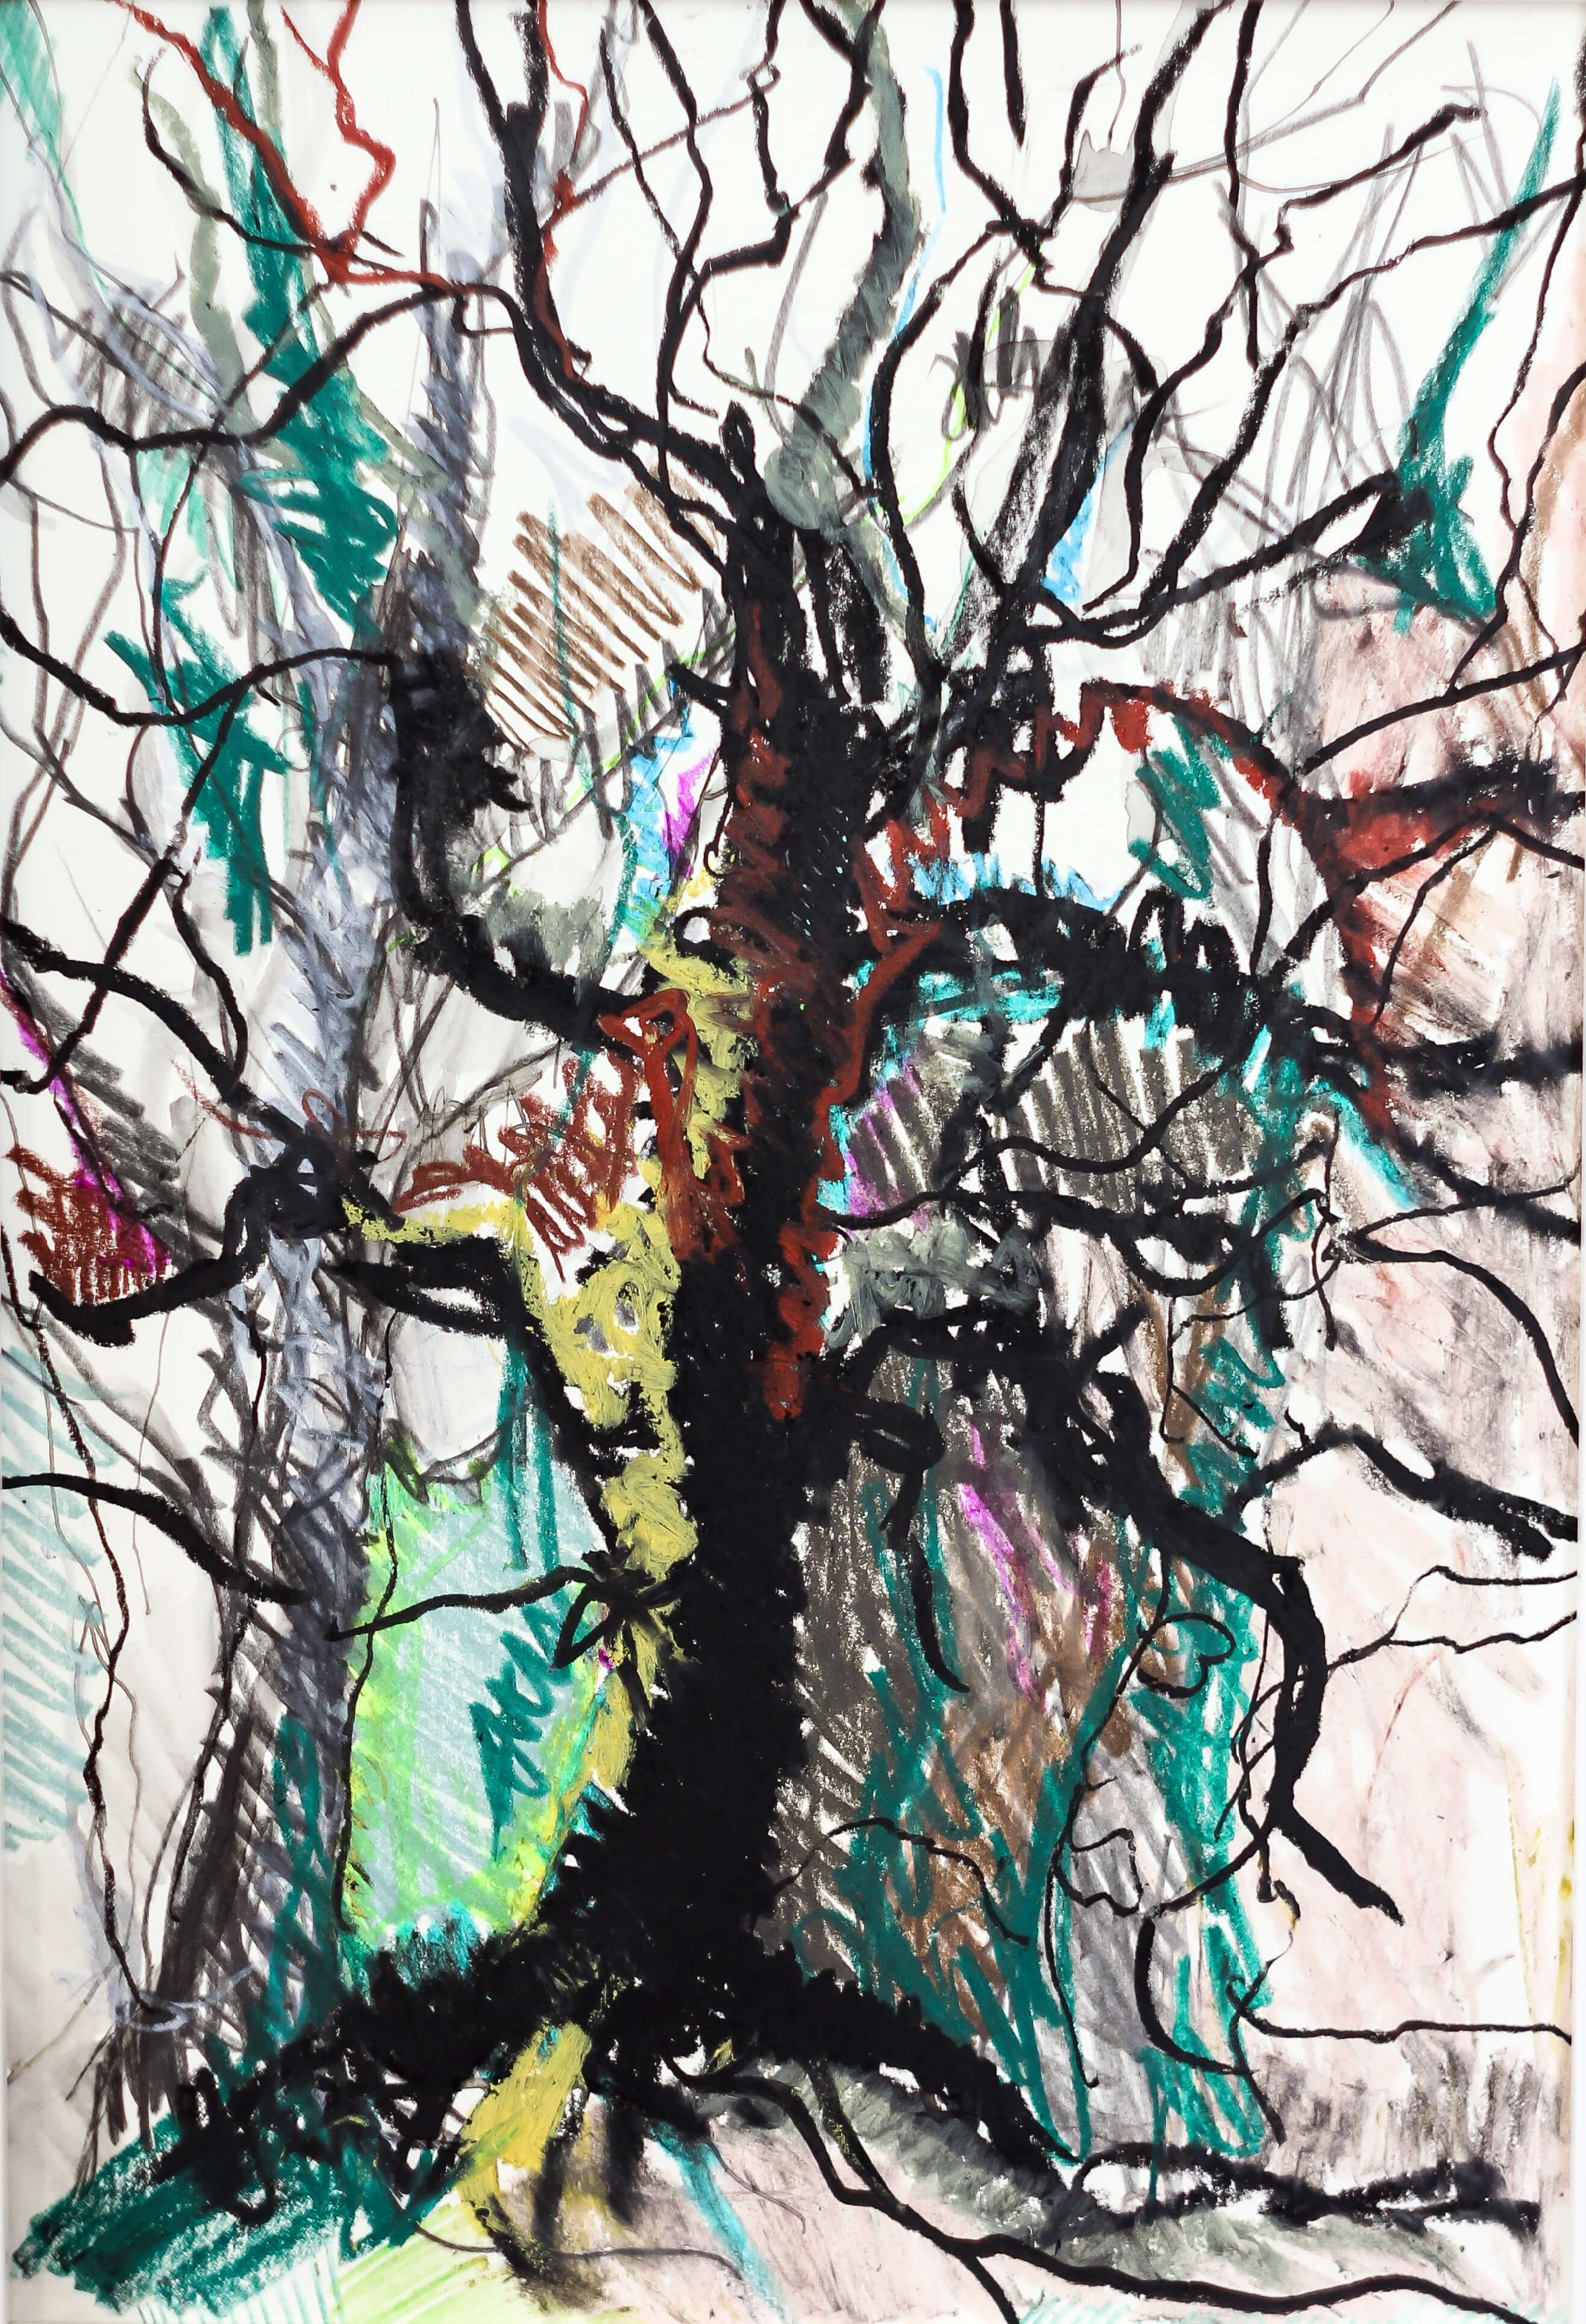 Katharina Albers, Wald VI, 2014, Ölkreide, Tusche, Aquarell, Graphit auf Papier, 29,7×21 cm